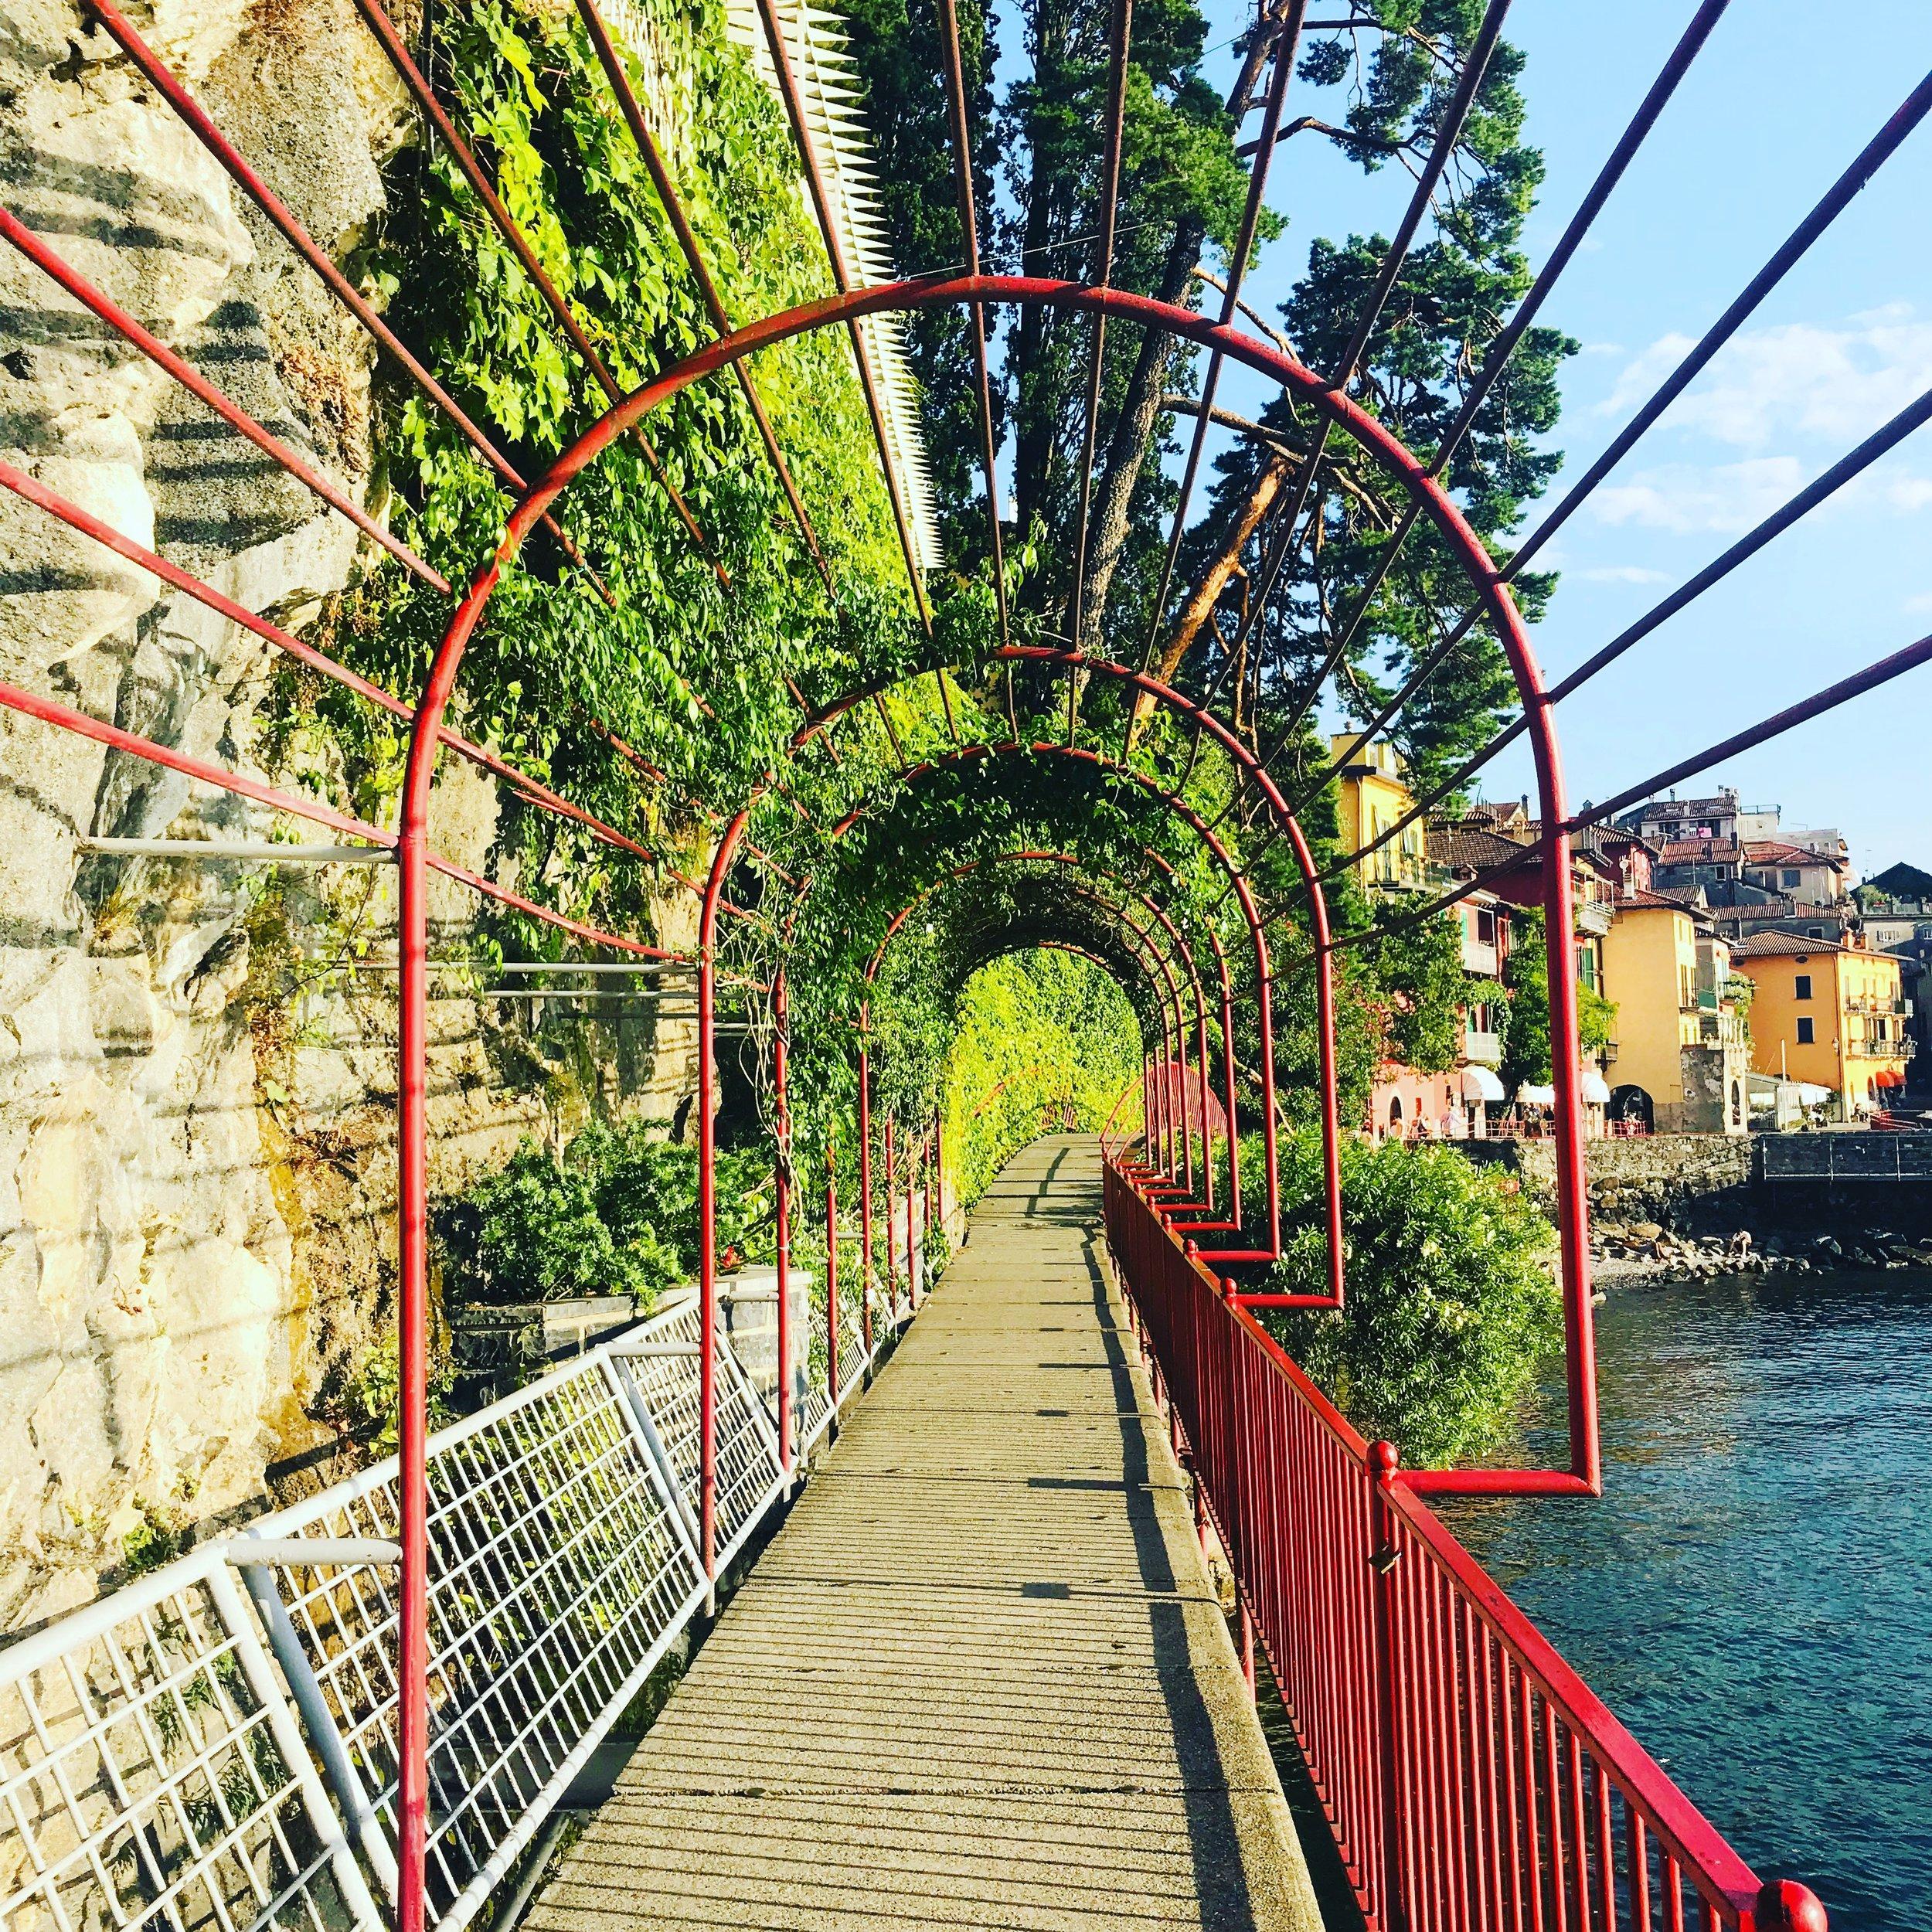 Lake Como and Varenna, Italy